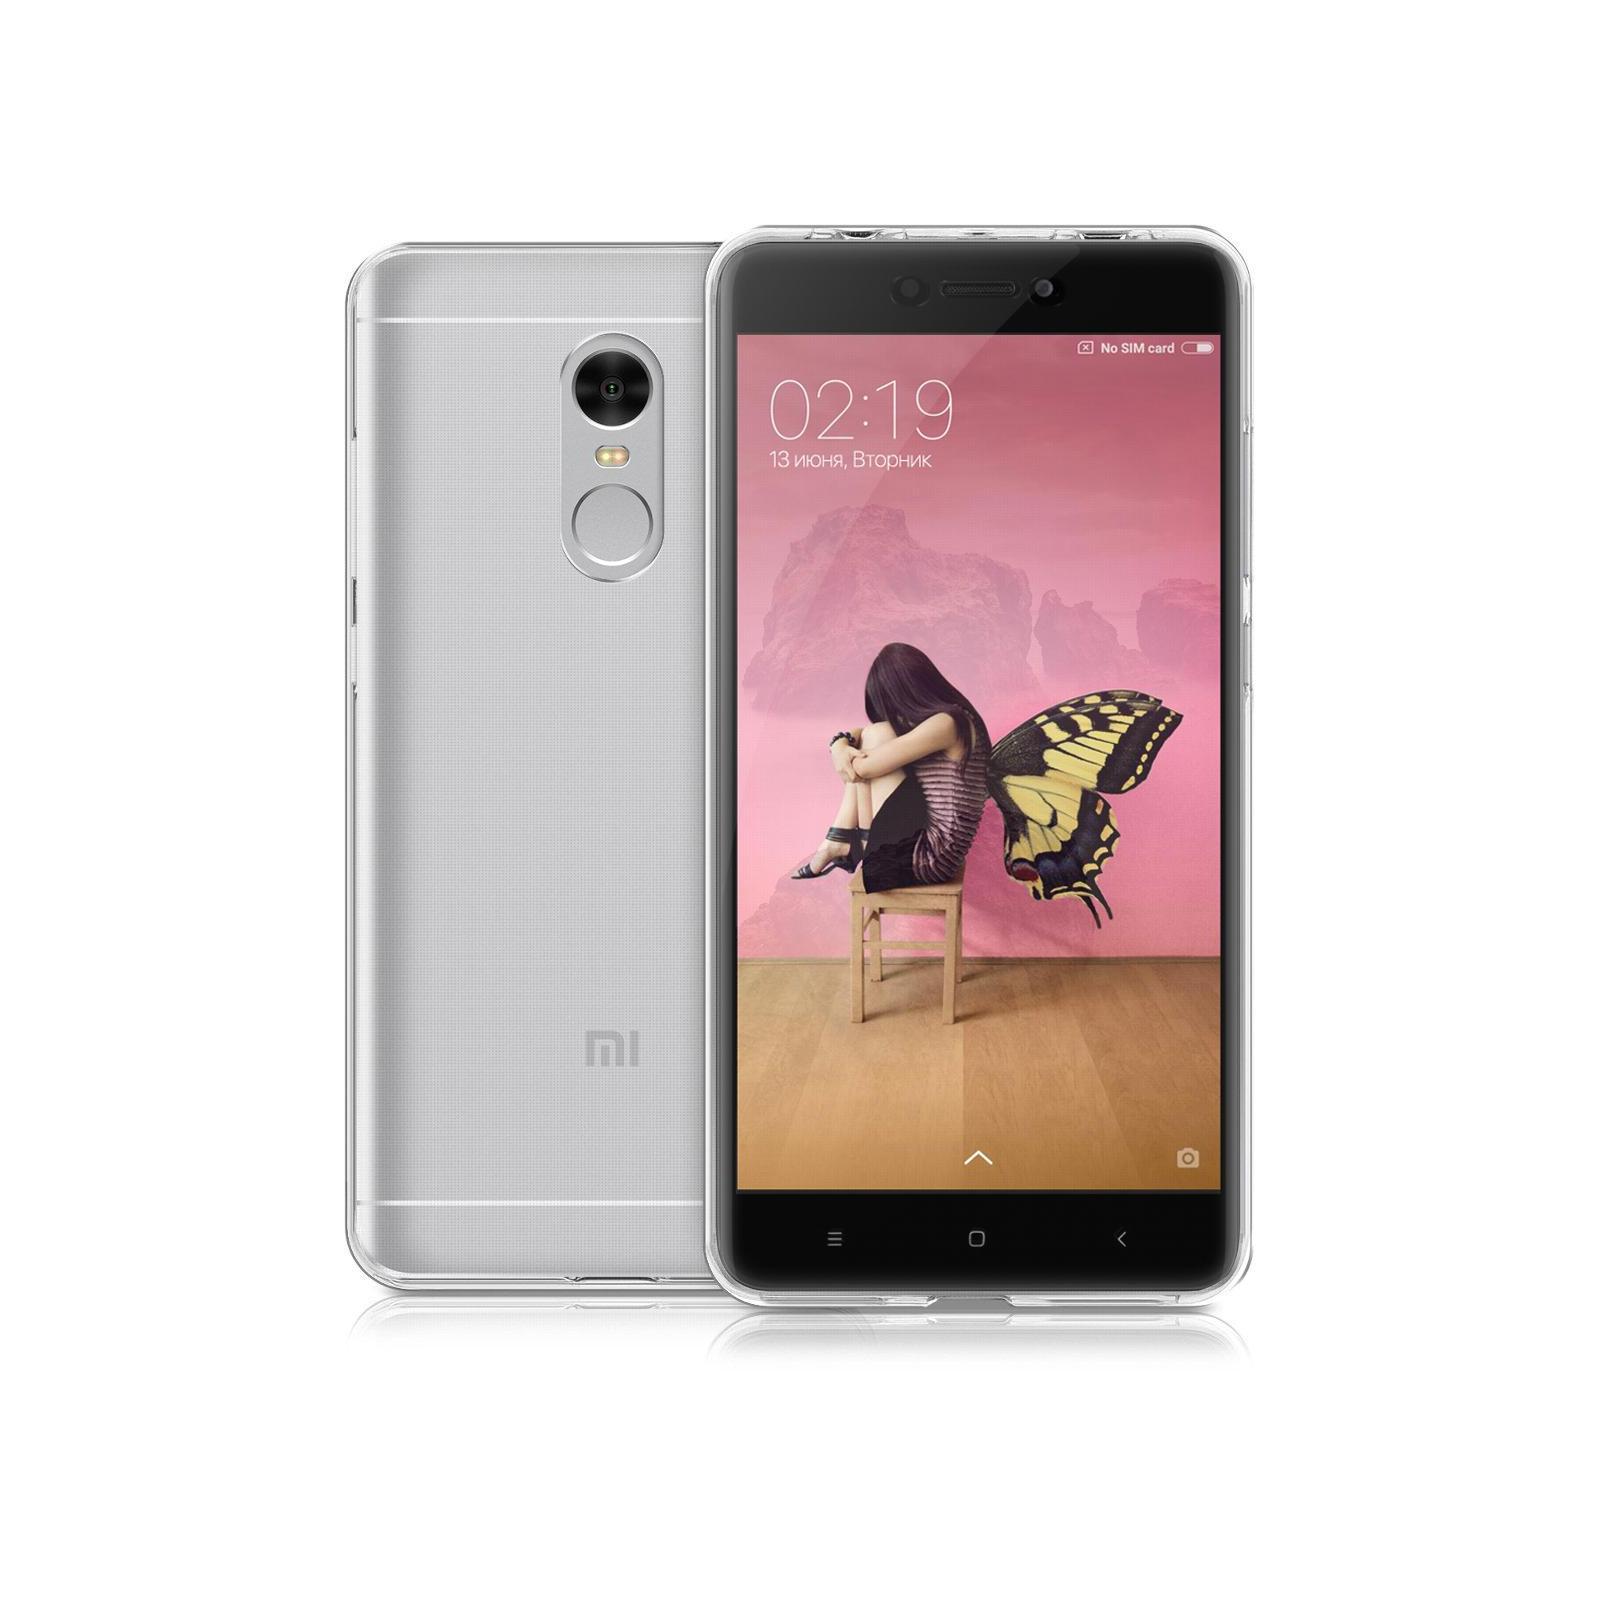 Чехол для моб. телефона SmartCase Xiaomi Redmi Note 4 TPU Clear (SC-RMIN4) изображение 3